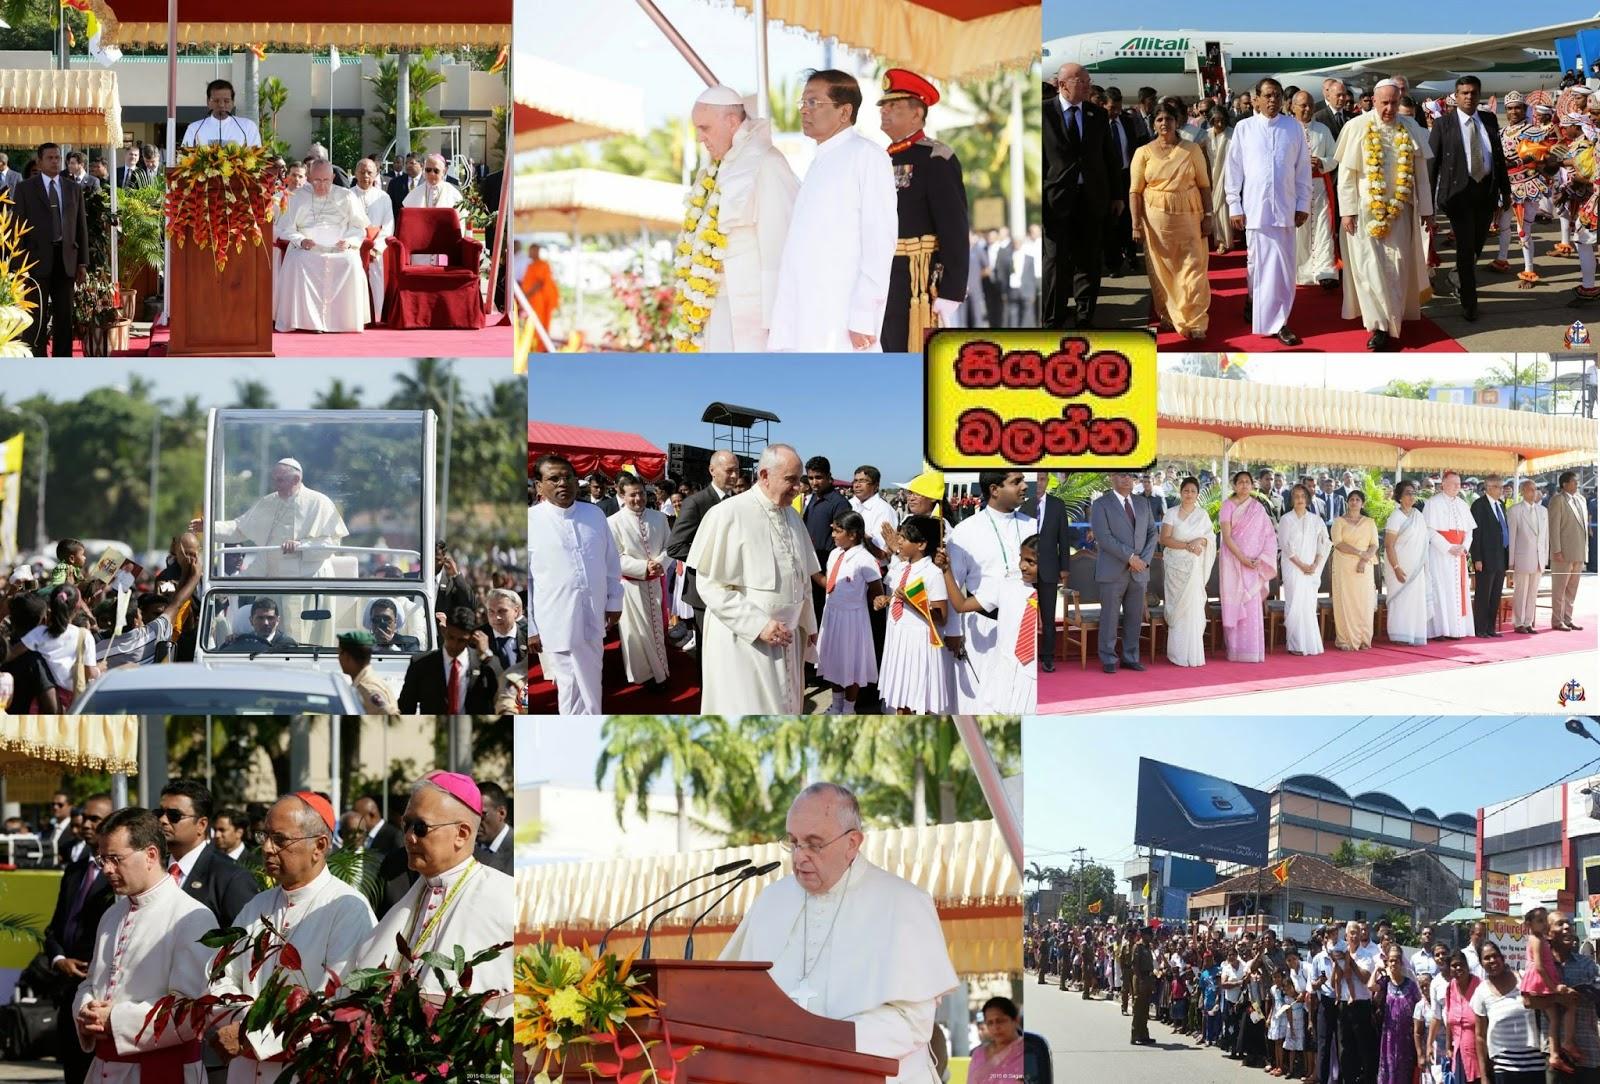 http://picture.gossiplankahotnews.com/2015/01/popes-visit-sri-lanka-2015.html